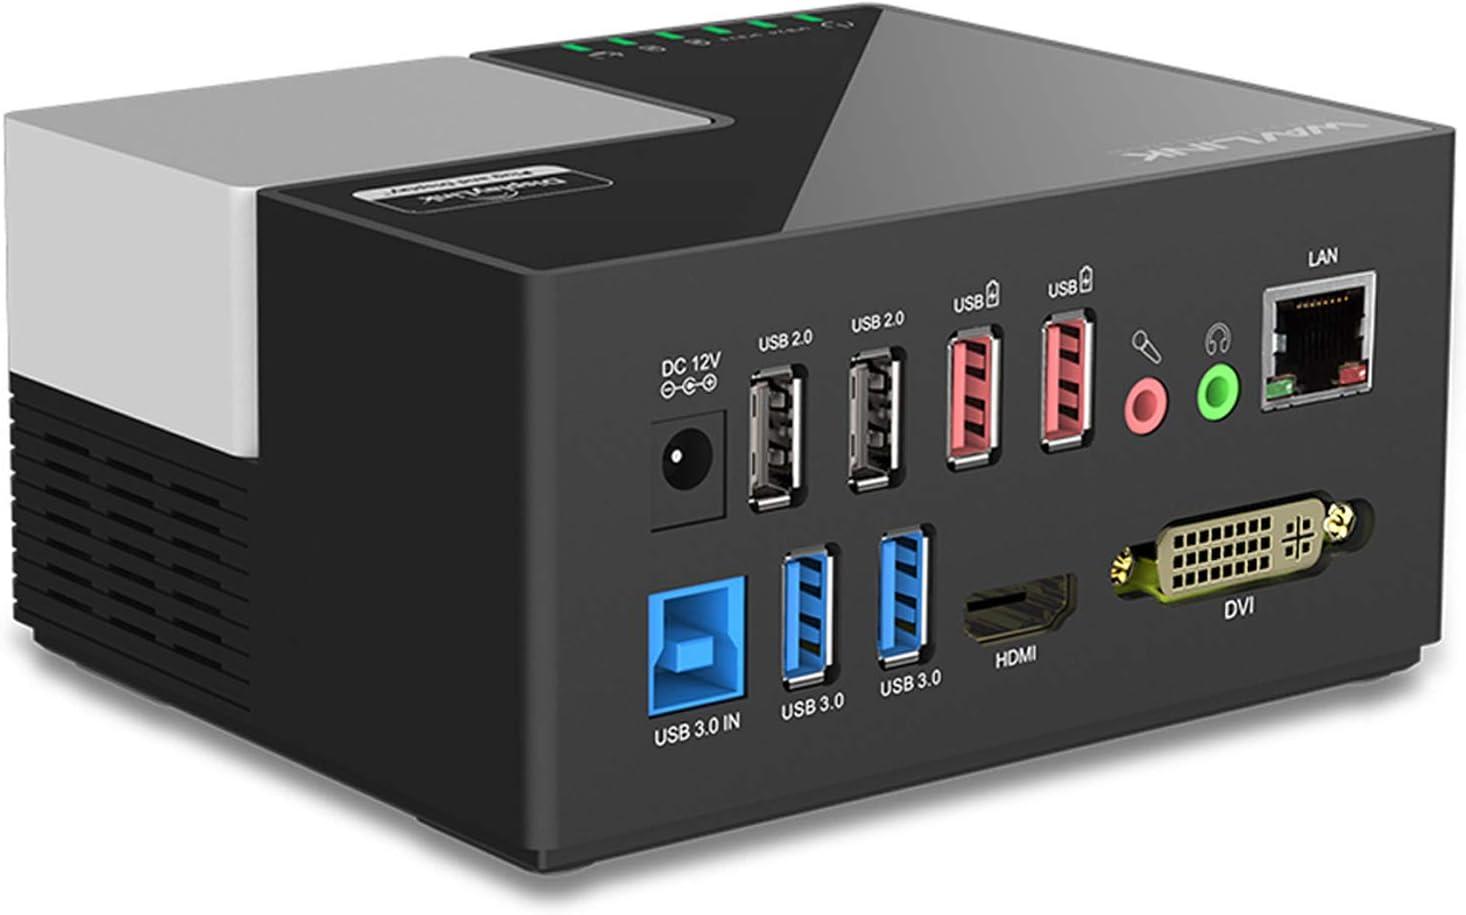 WAVLINK USB 3.0 Portátil Docking Station Multifuncional Dual Video Monitor Display DVI, HDMI, Gigabit Ethernet, Audio, 6 USB Puertos,DP, Soporta Windows, Mac OS, Android-Negro